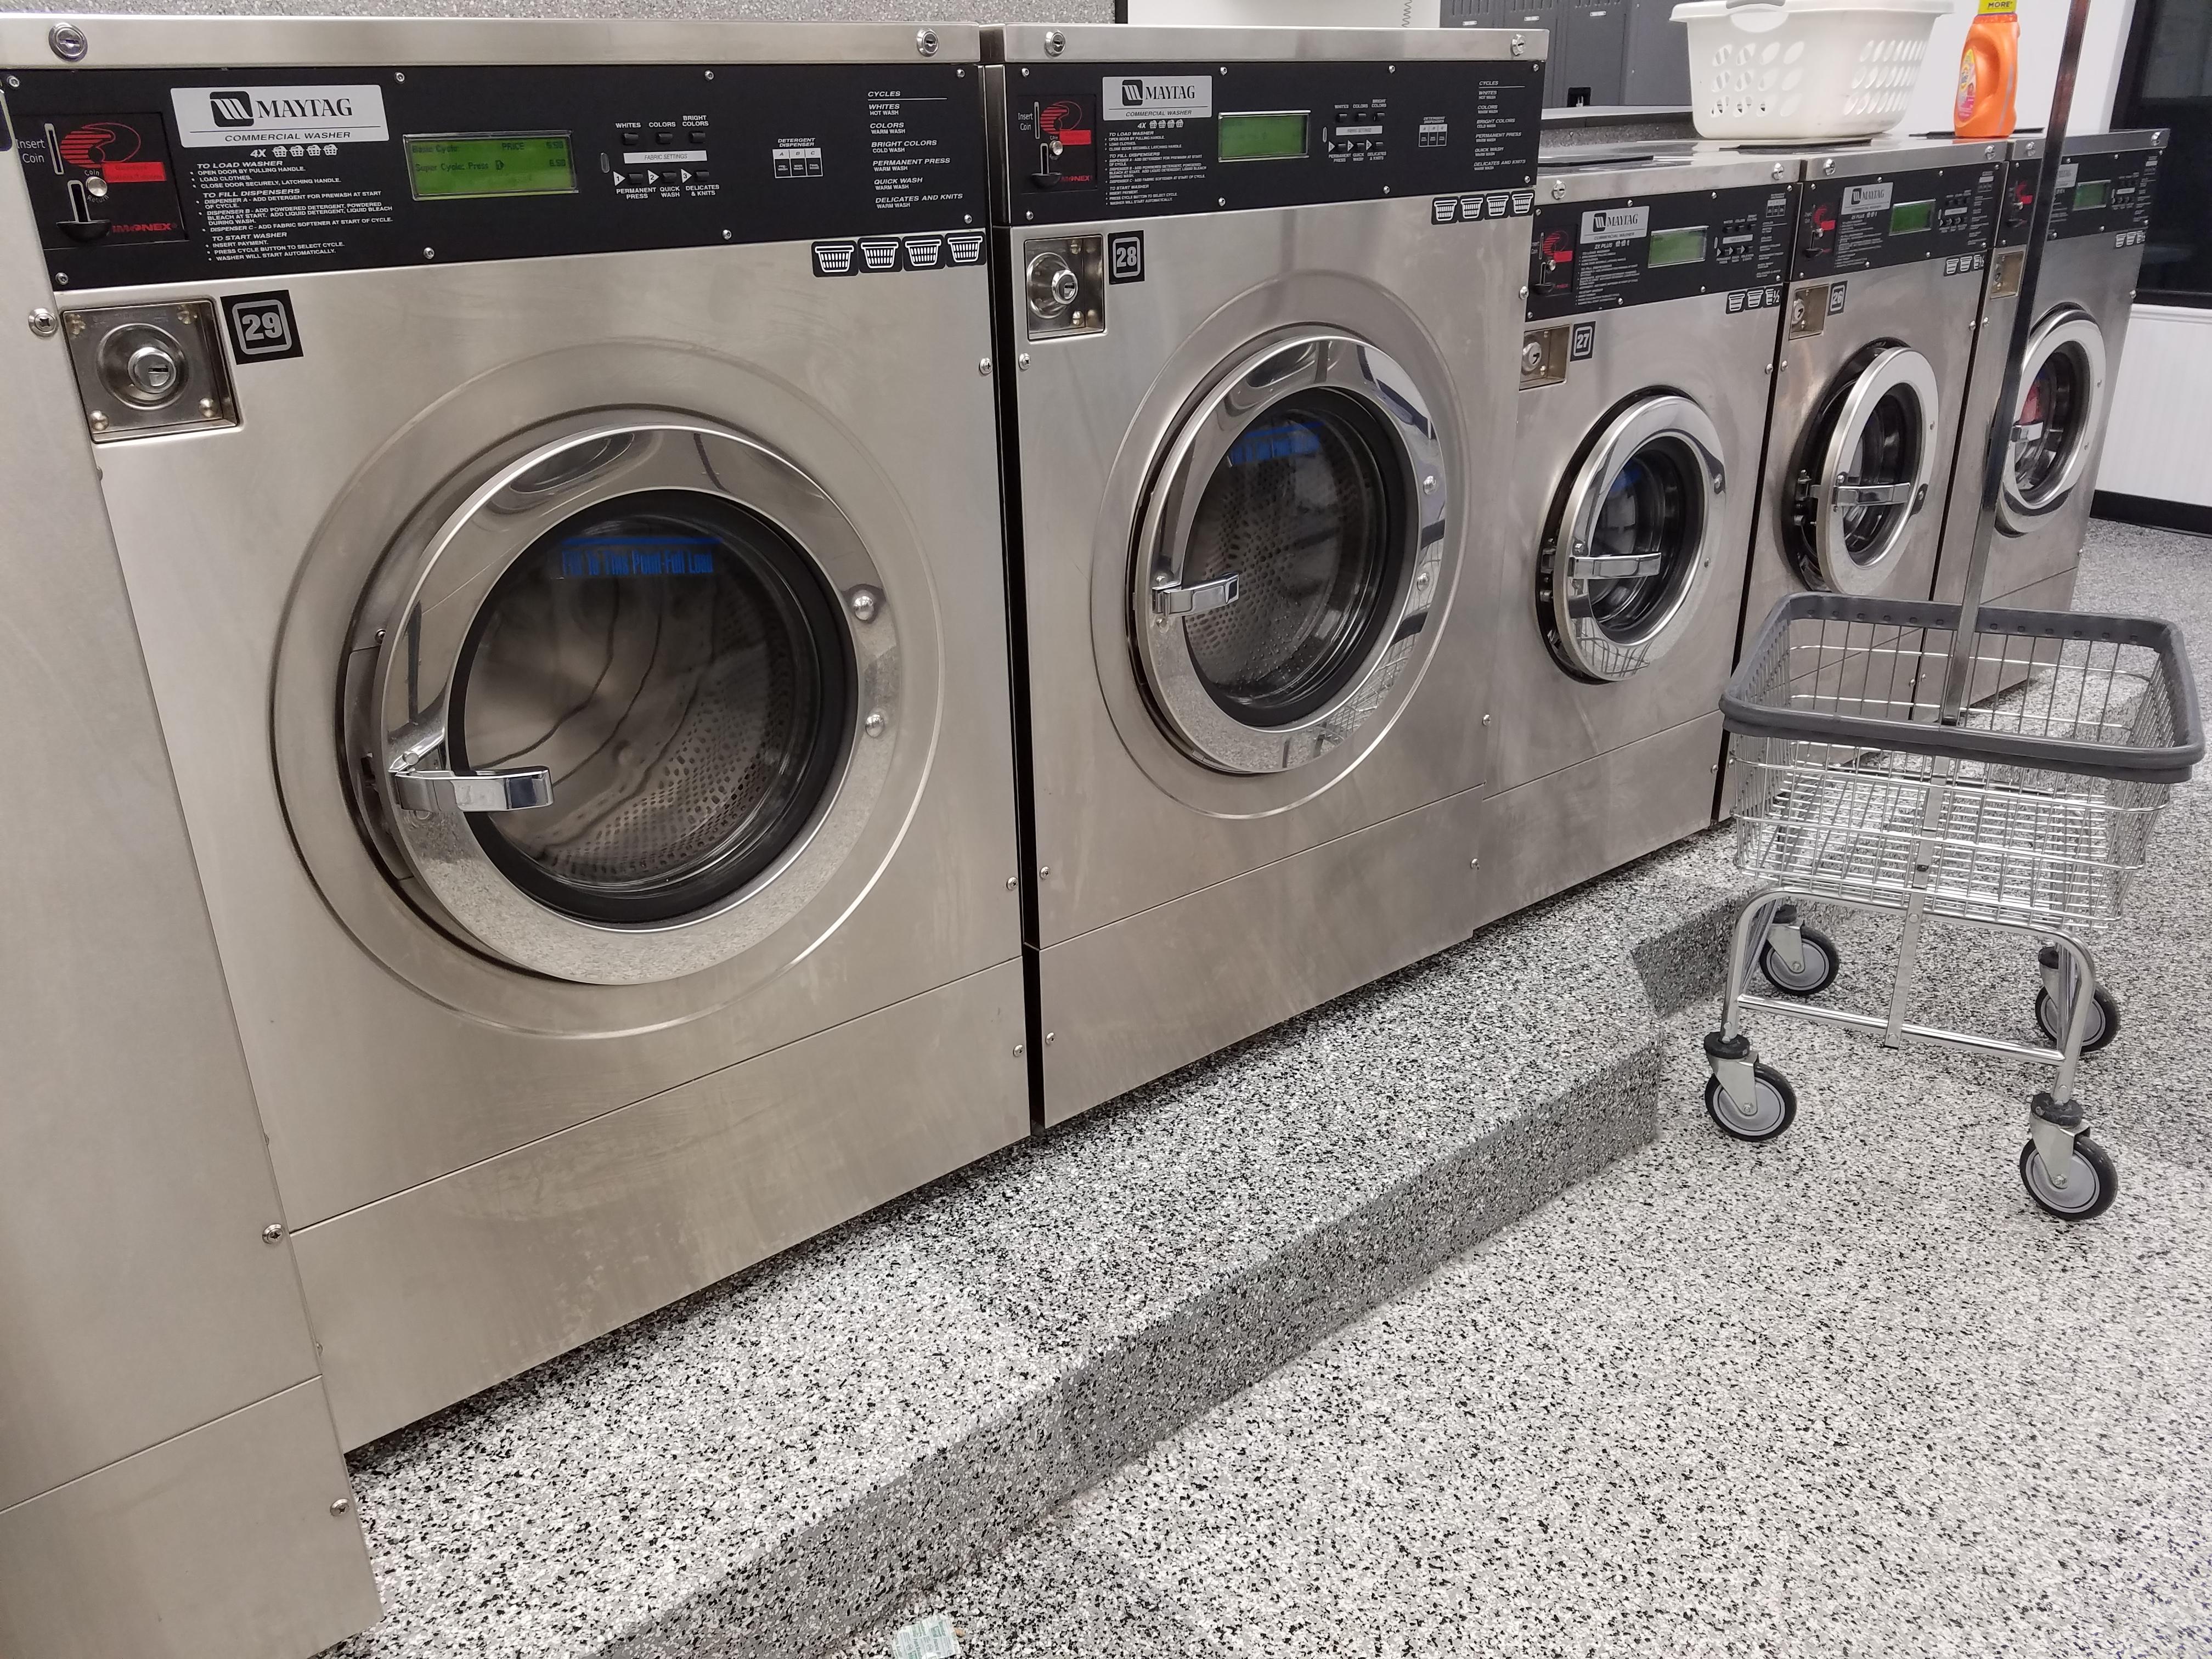 laundromat-37.jpg